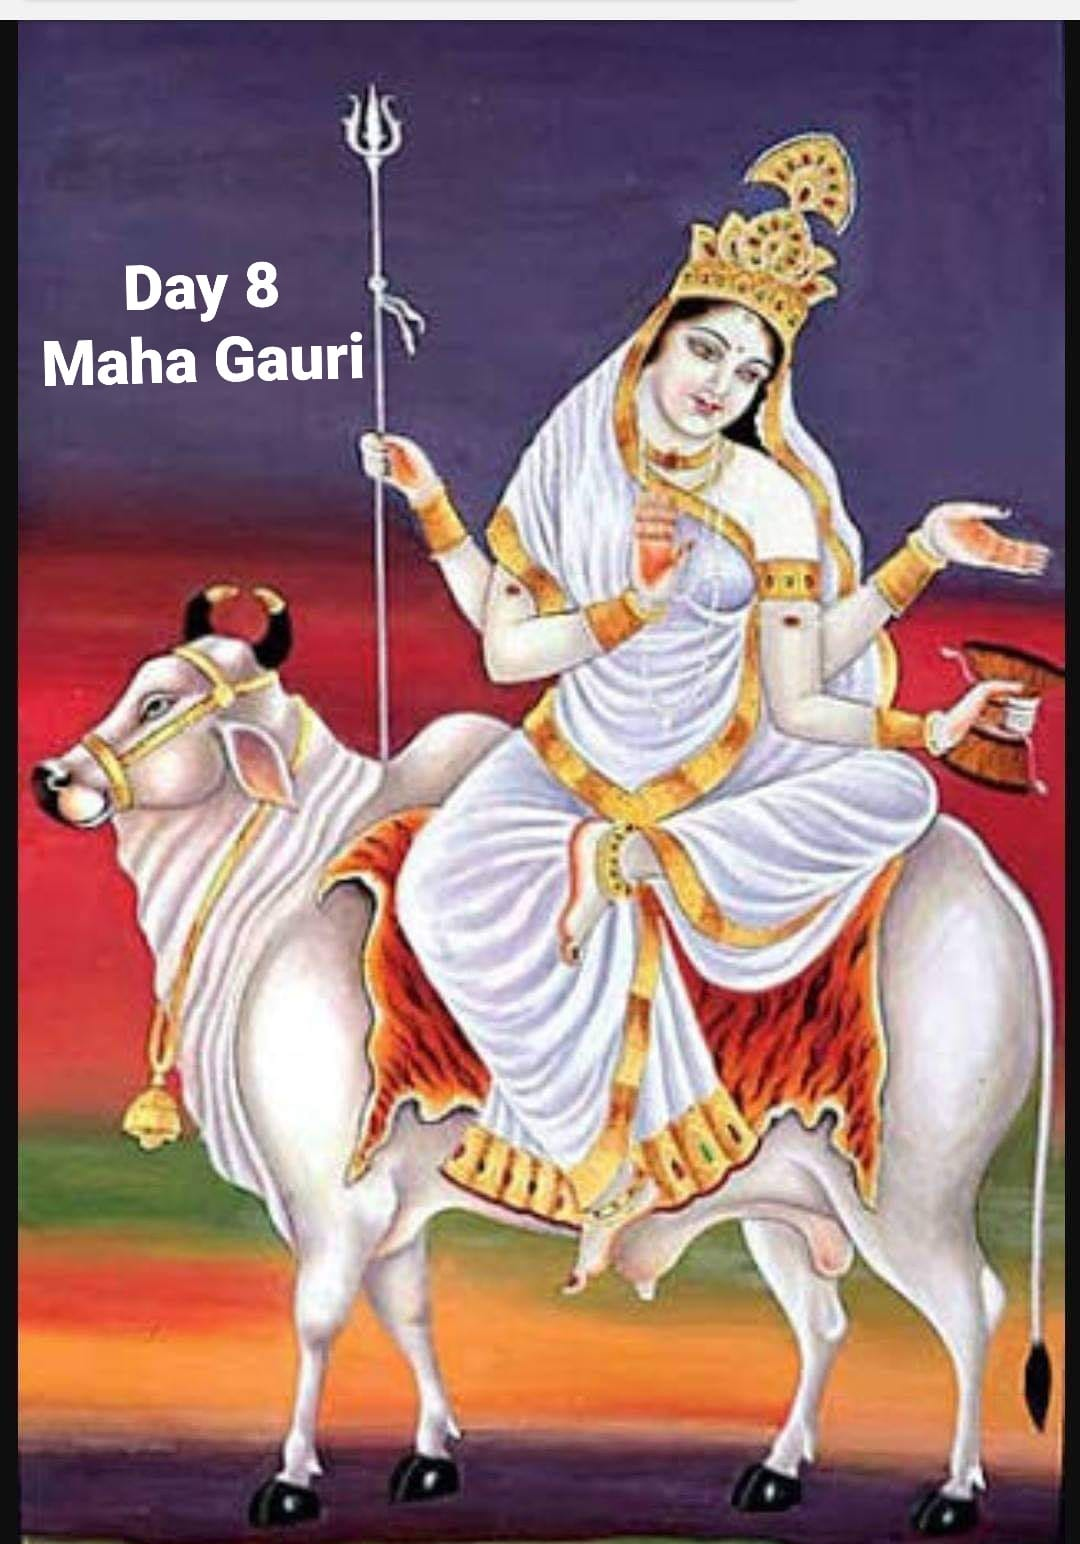 Navaratri Day 8 – Mahagauri Devi